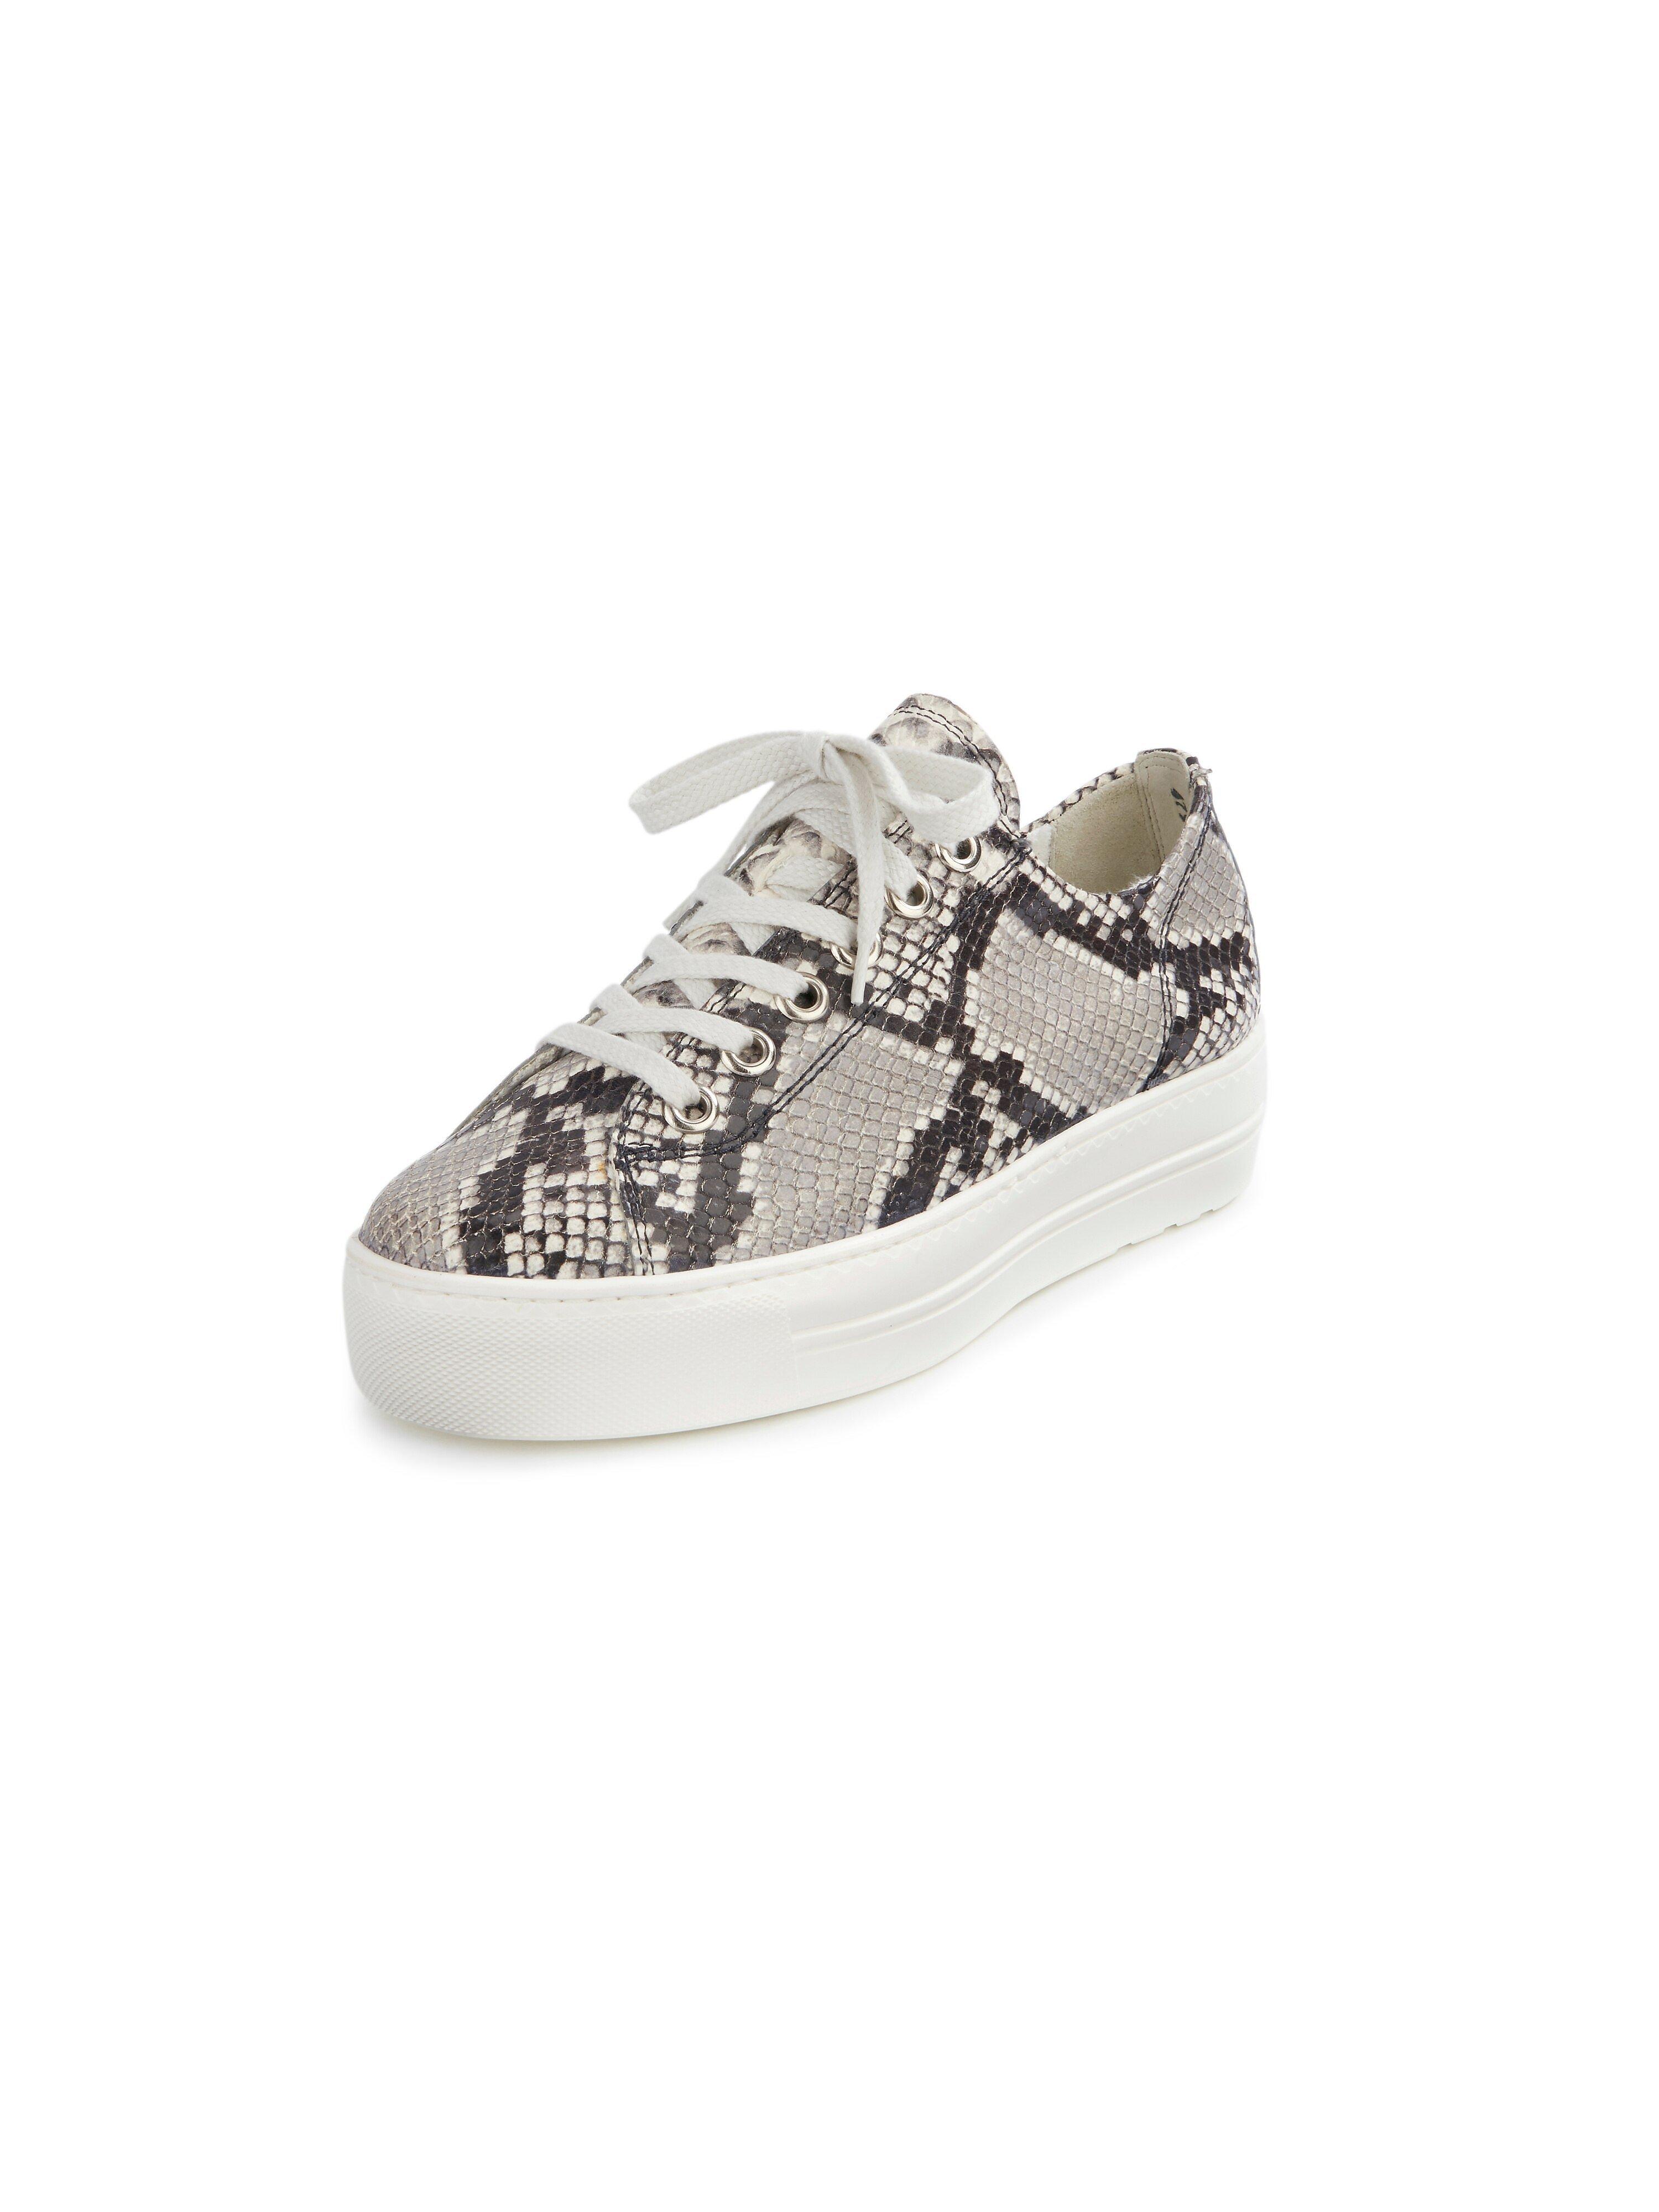 Sneakers Van Paul Green multicolour